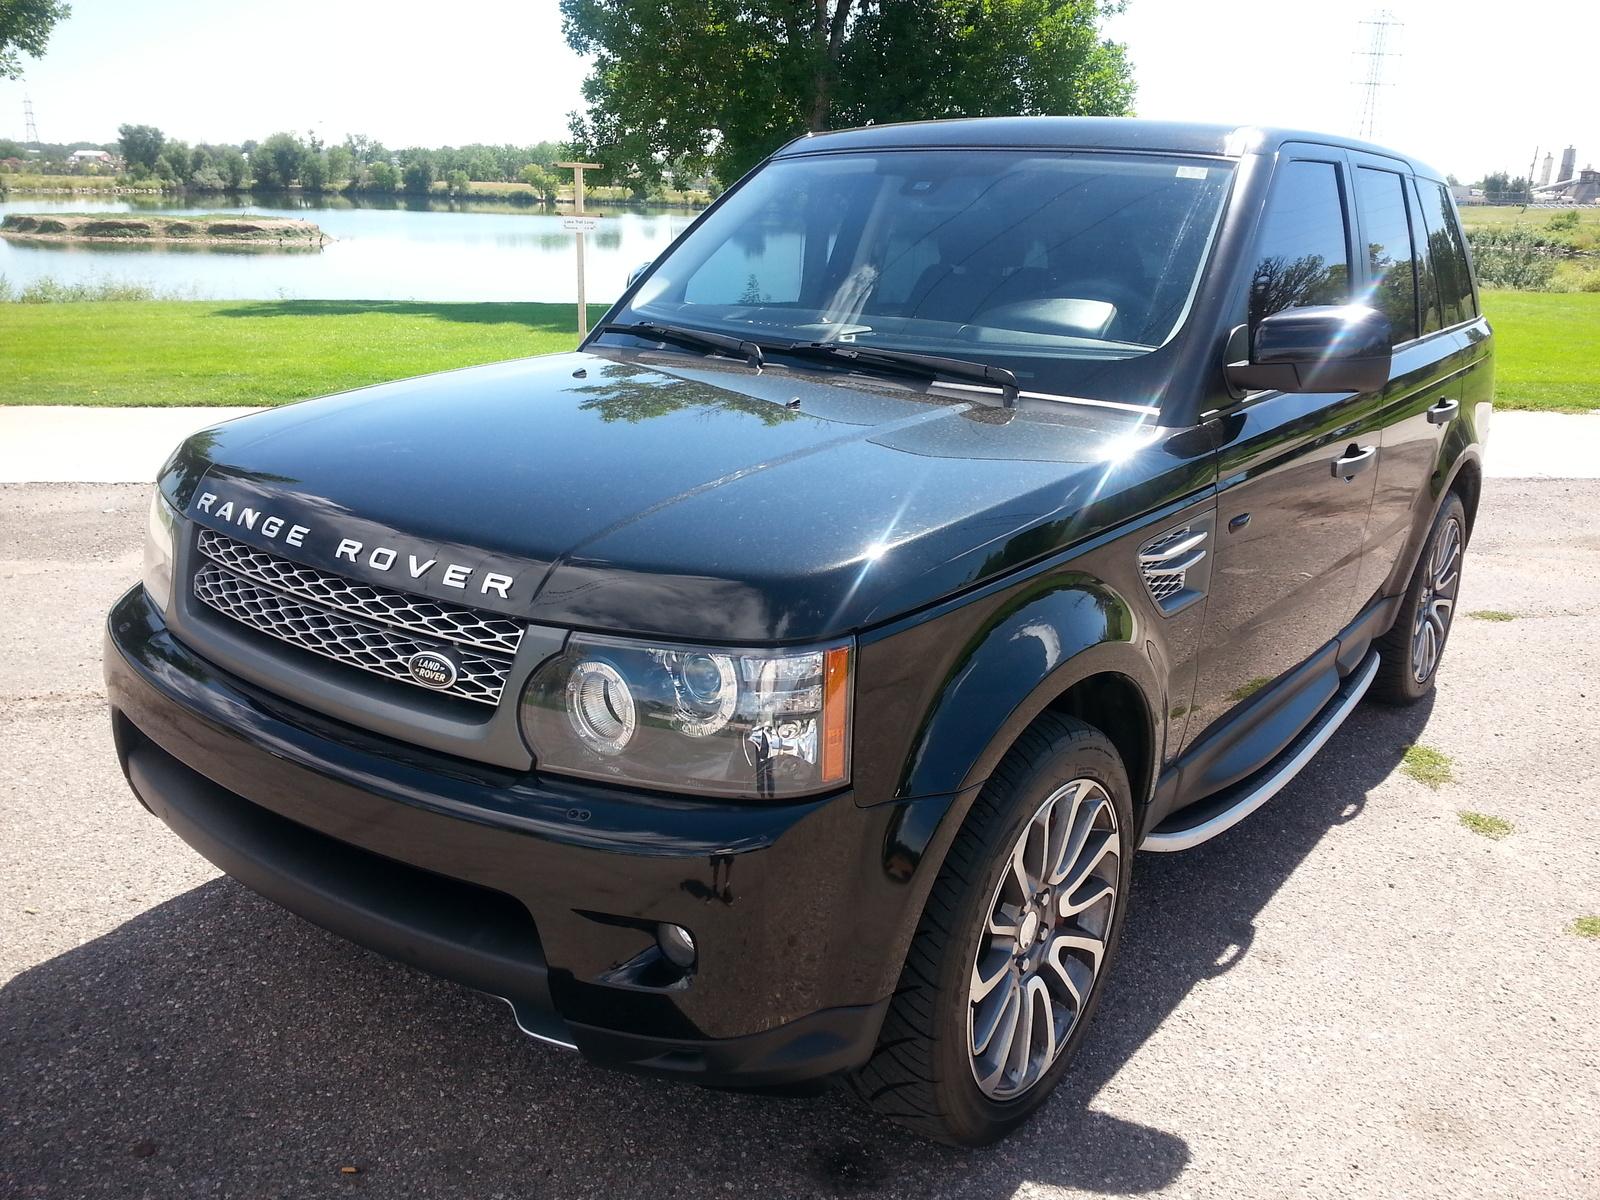 2011 Land Rover Range Rover Sport Pictures Cargurus